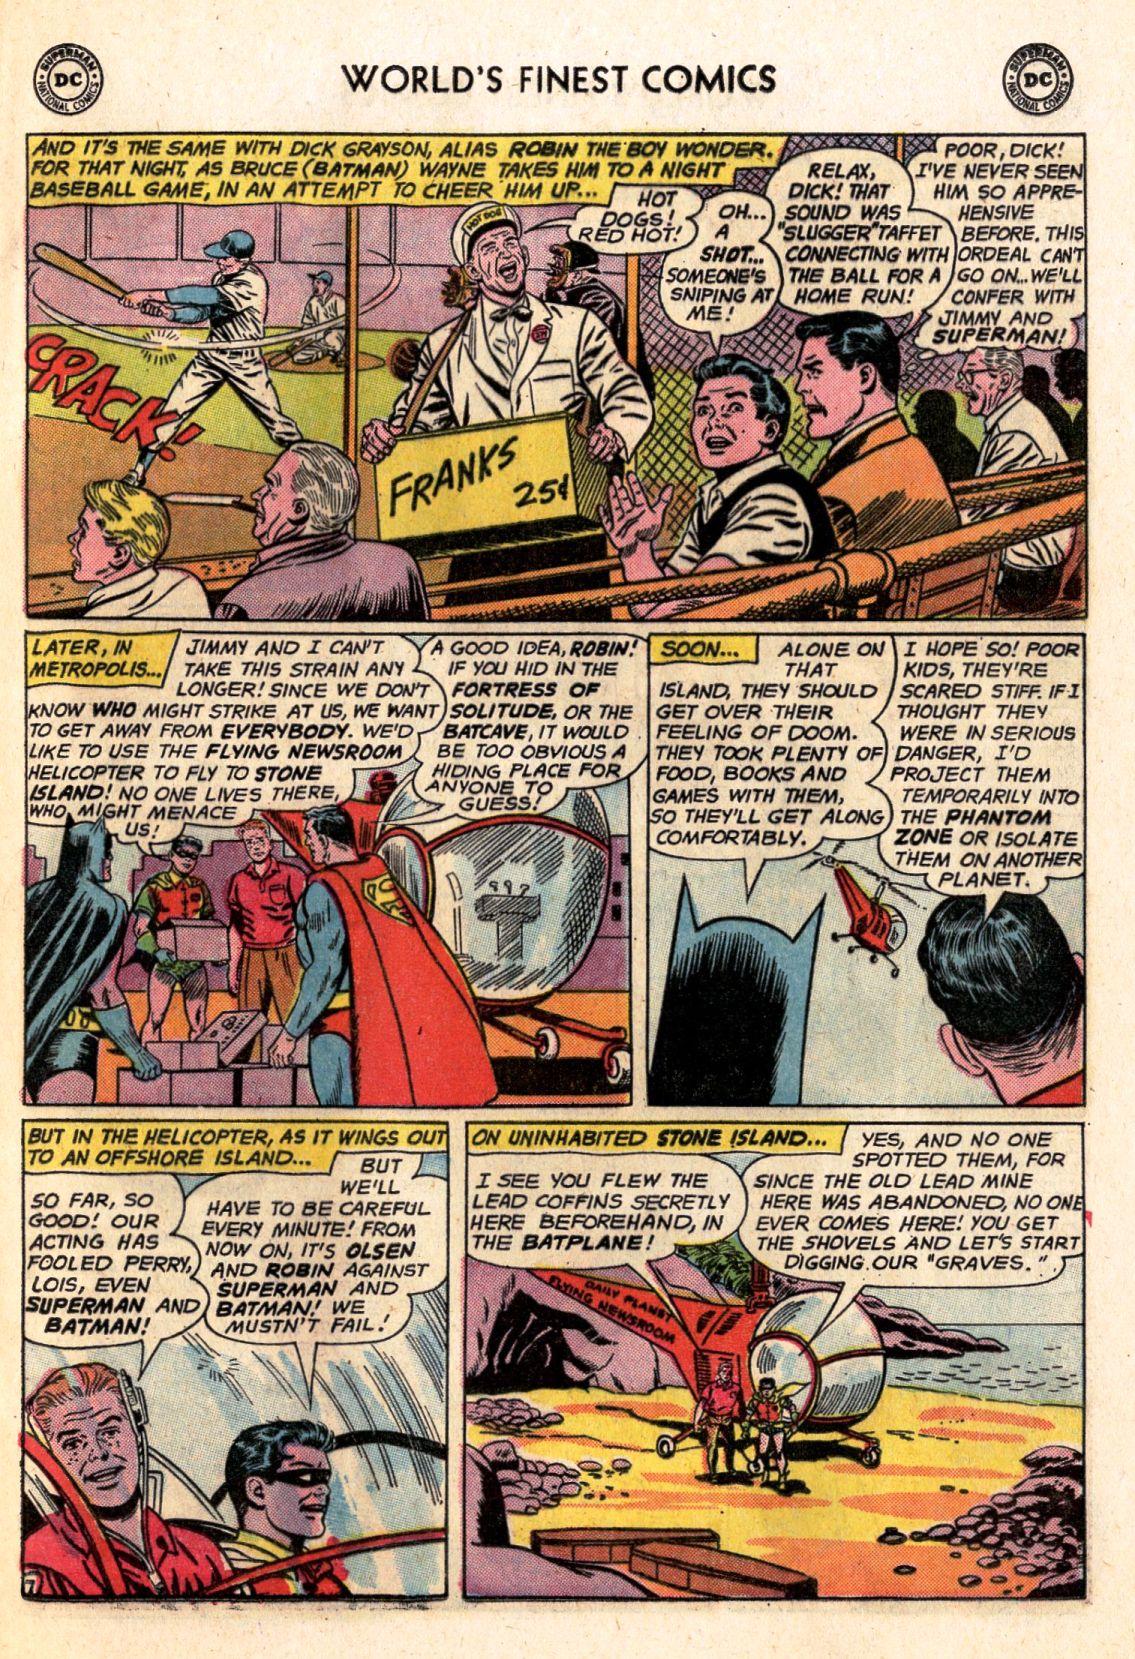 Read online World's Finest Comics comic -  Issue #141 - 9